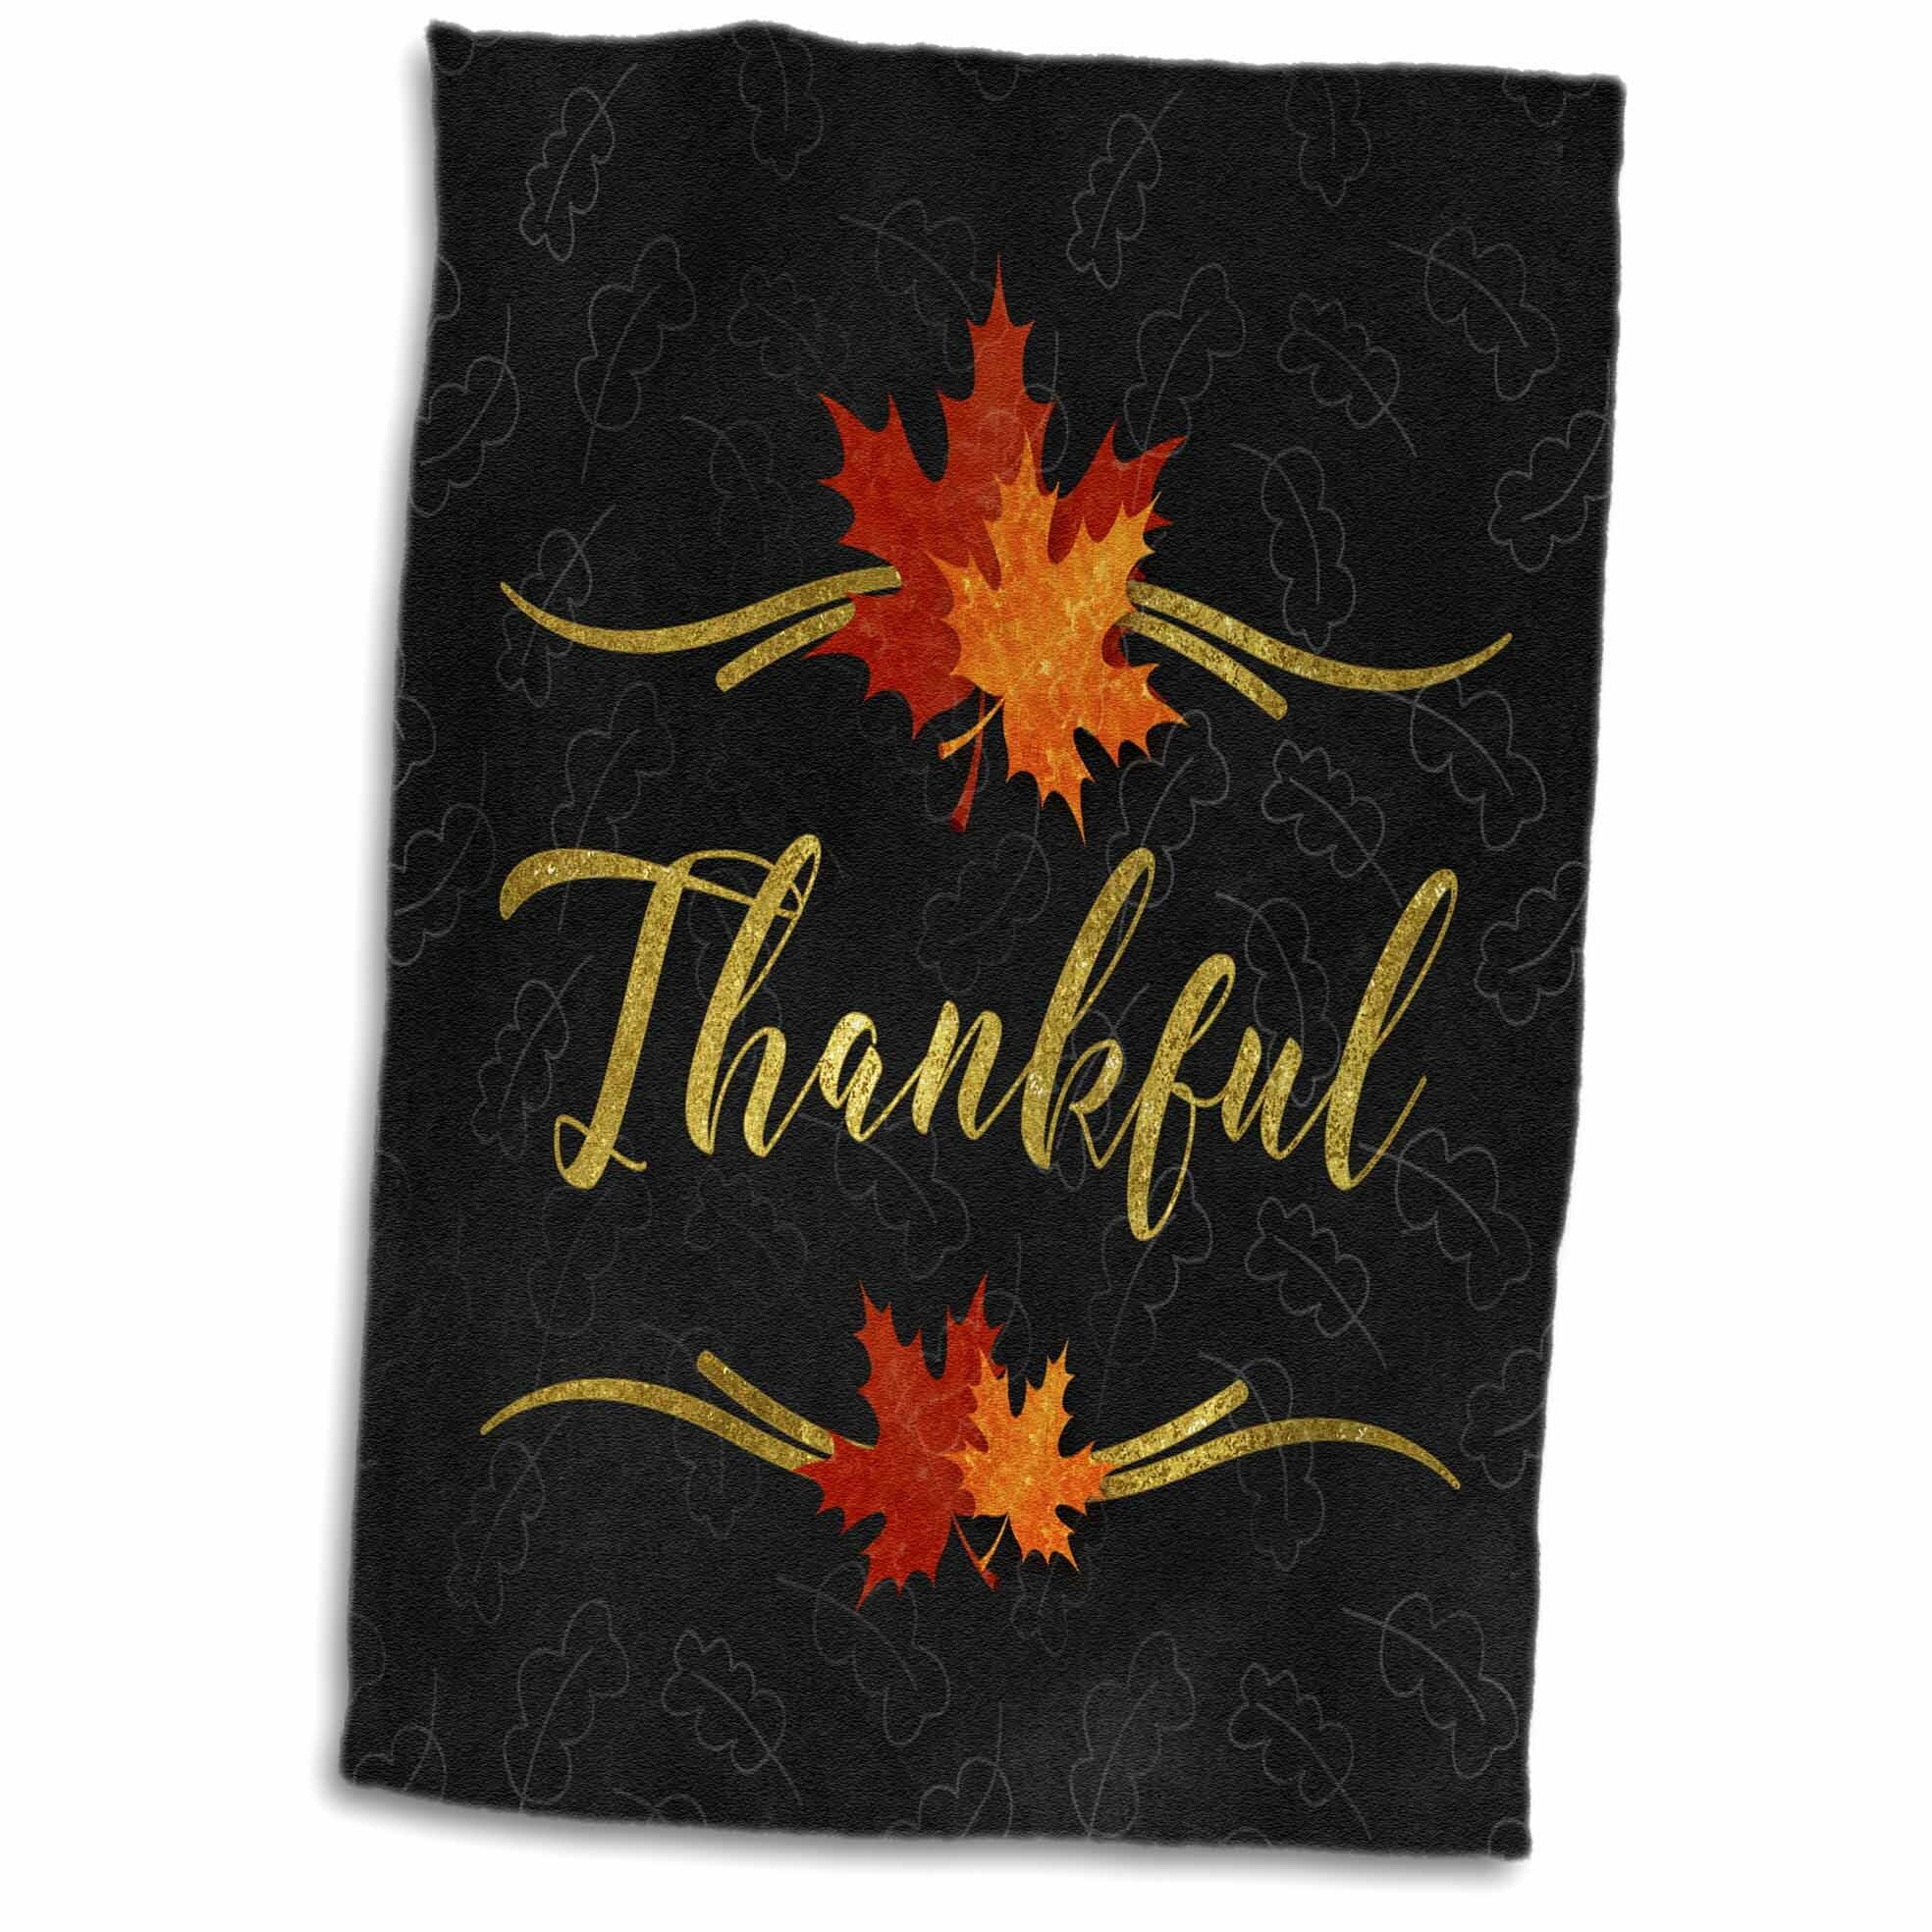 06b96984c77ba Pandora Thankful Typography Leaf and Chalkboard Fall Theme Hand Towel